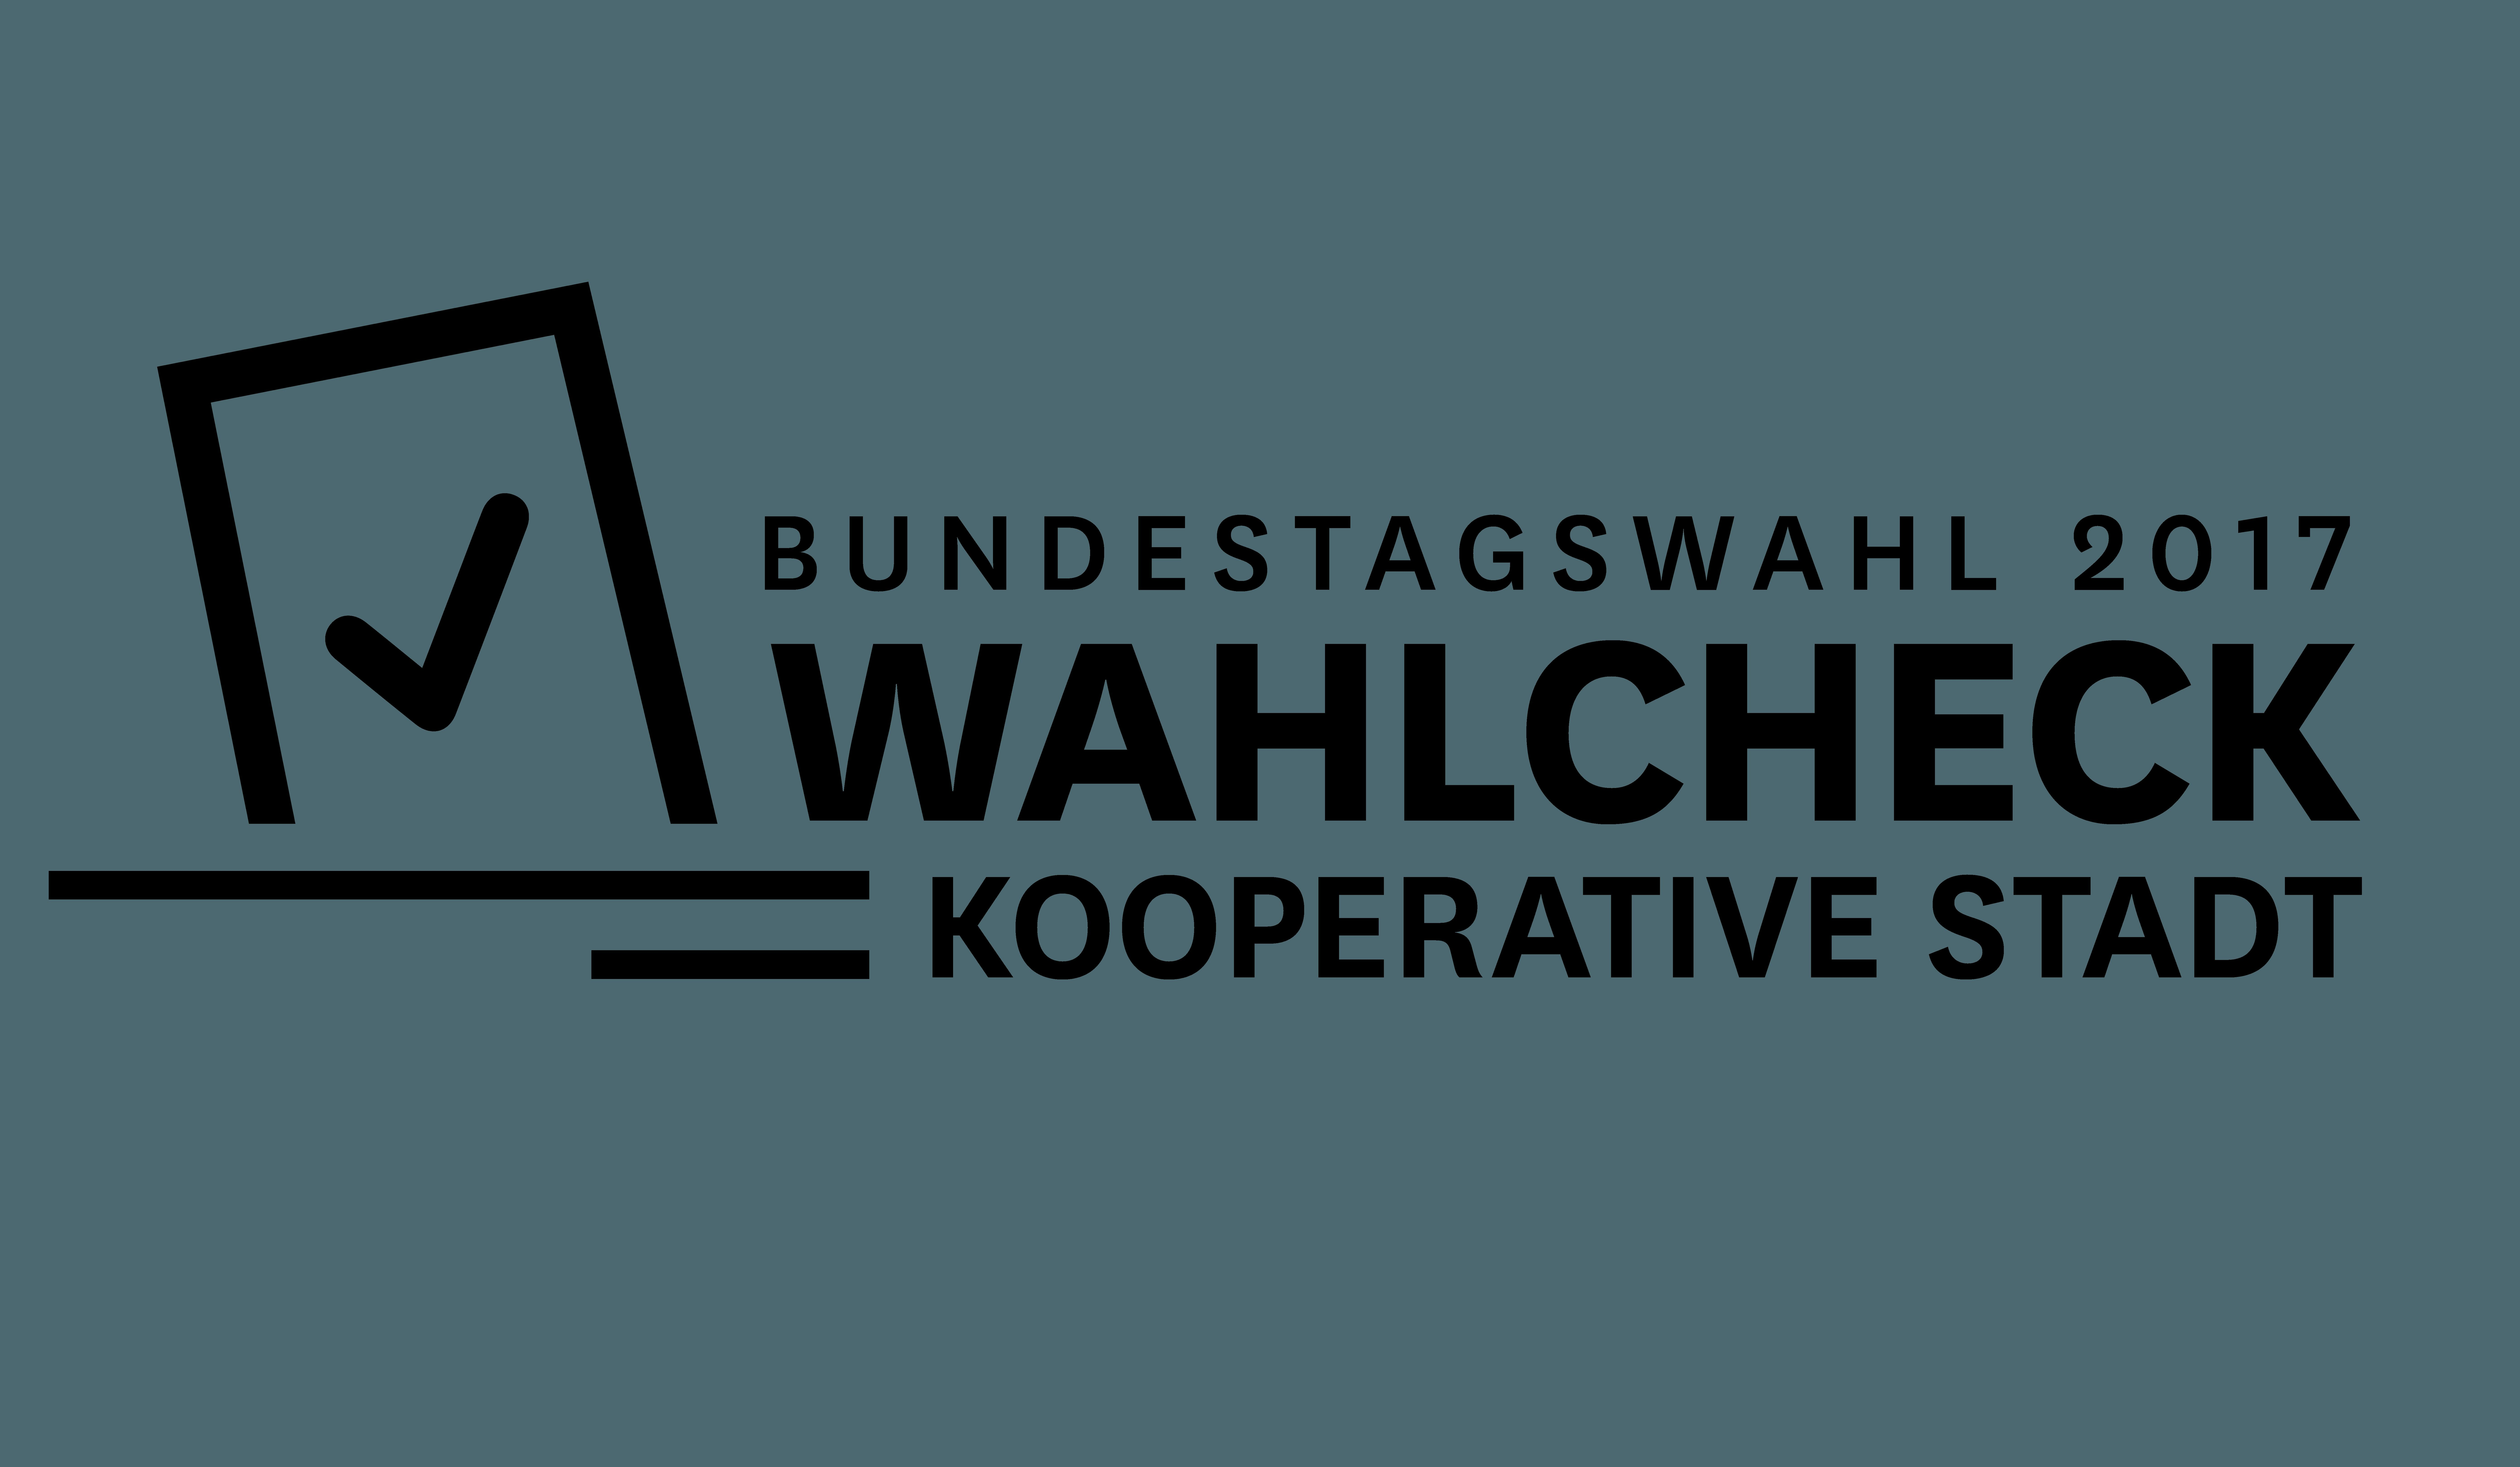 Wahlcheck KOOPERATIVE STADT